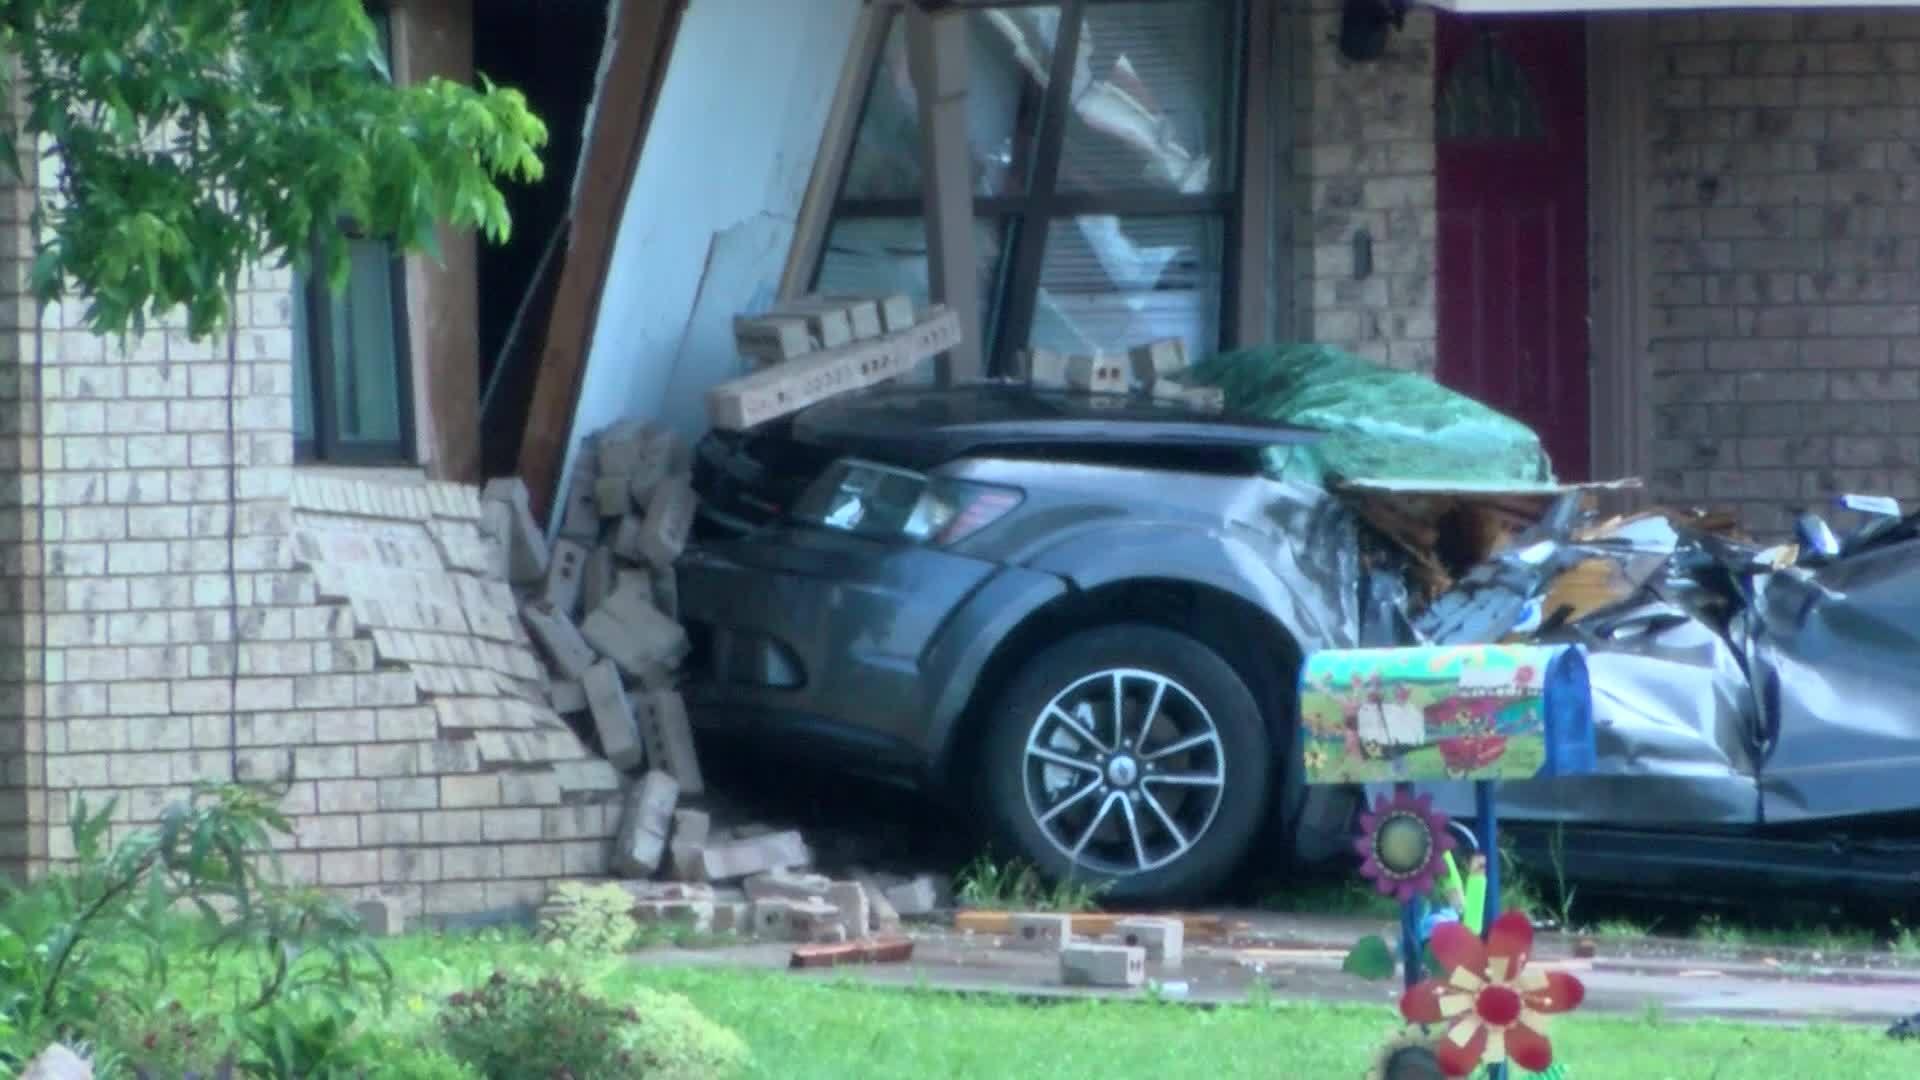 Northeast_San_Angelo_Storm_Damage_051819_4_20190518180529